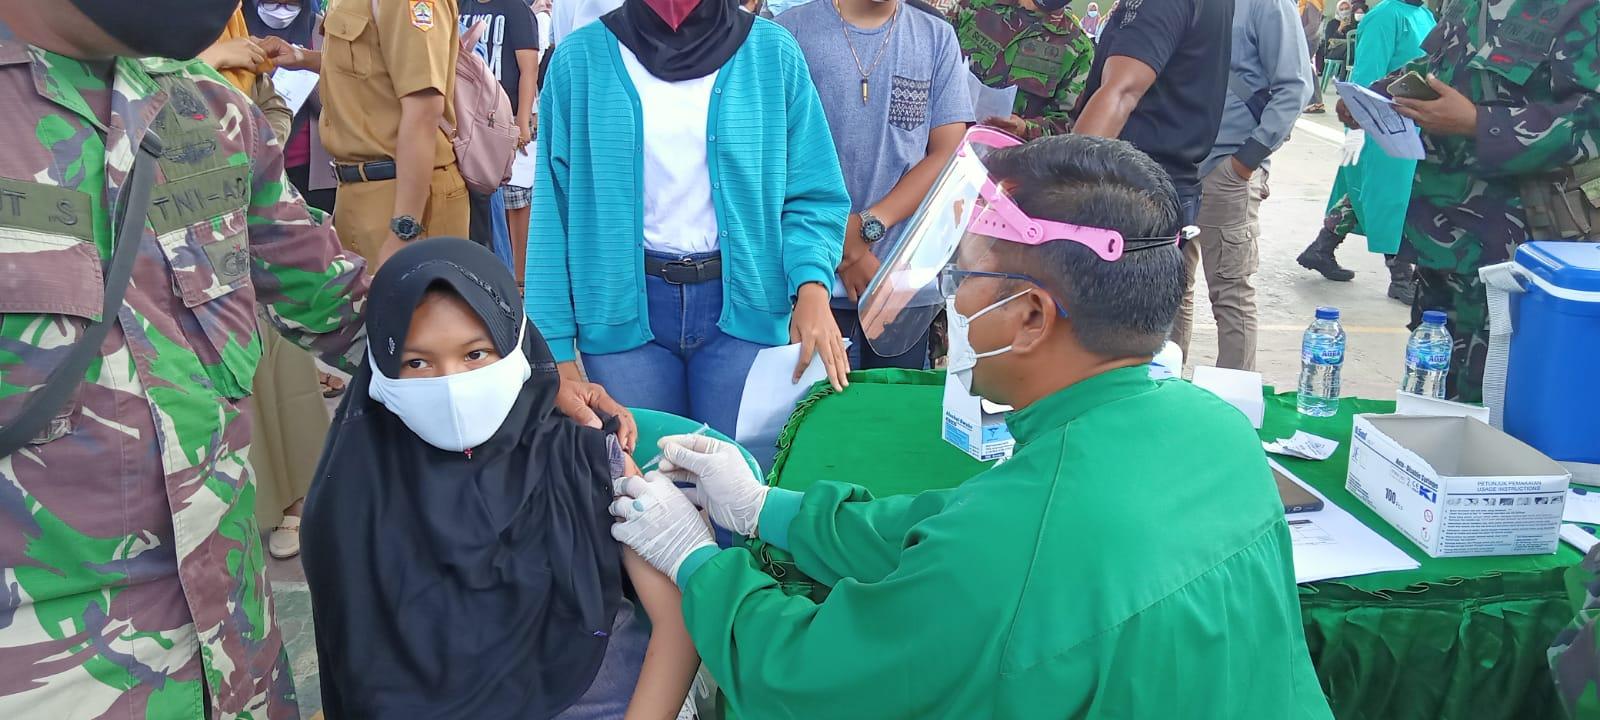 Jelang PTM, Pelajar di Purbalingga Mulai Divaksin Covid-19